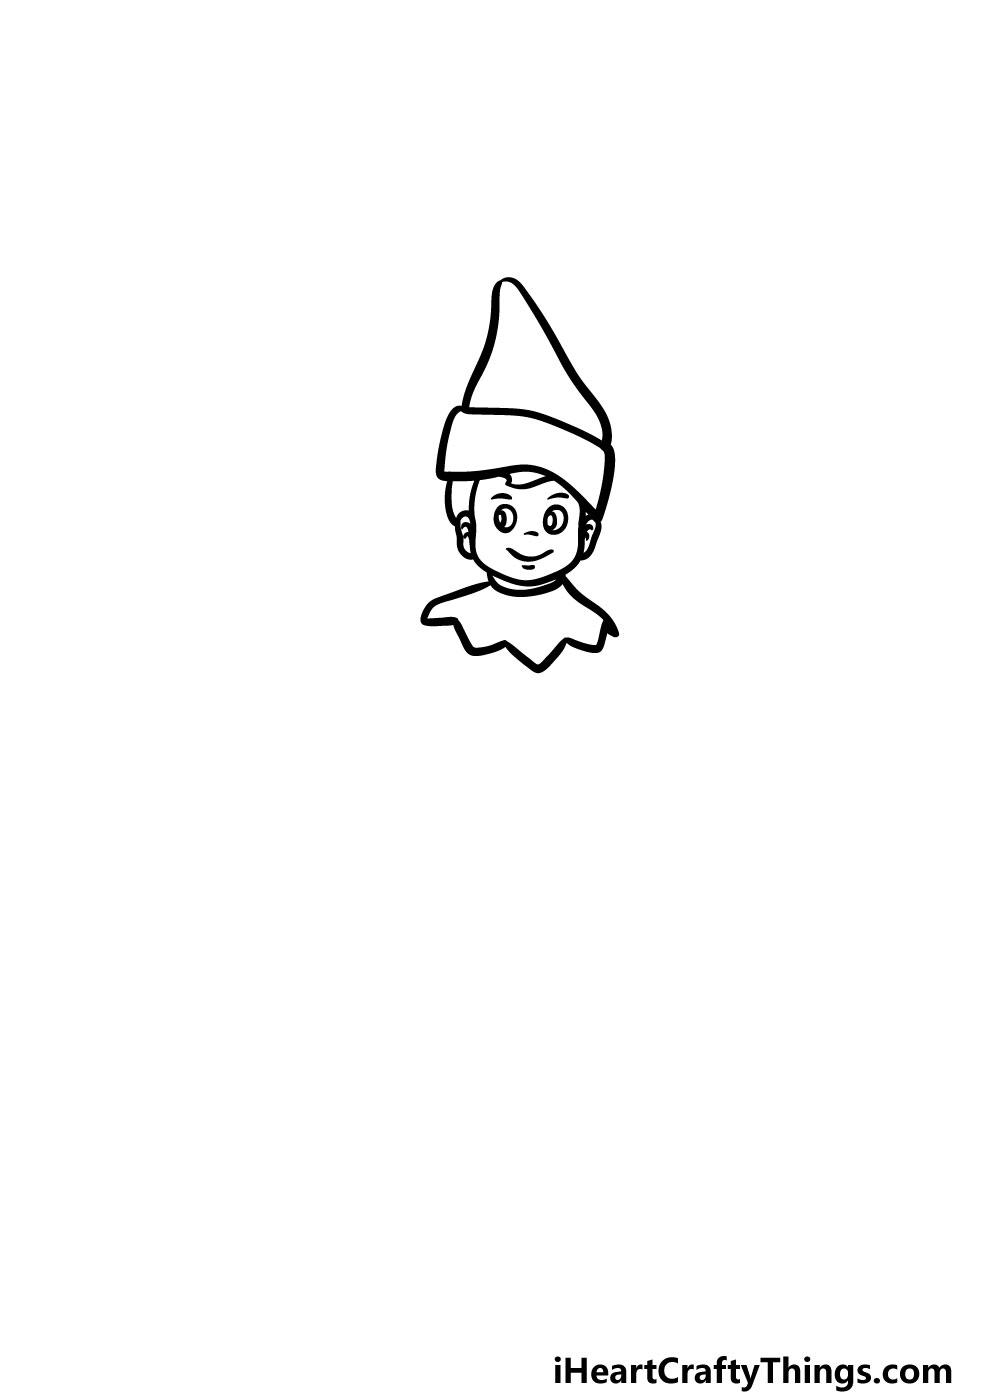 drawing an elf on a shelf step 3